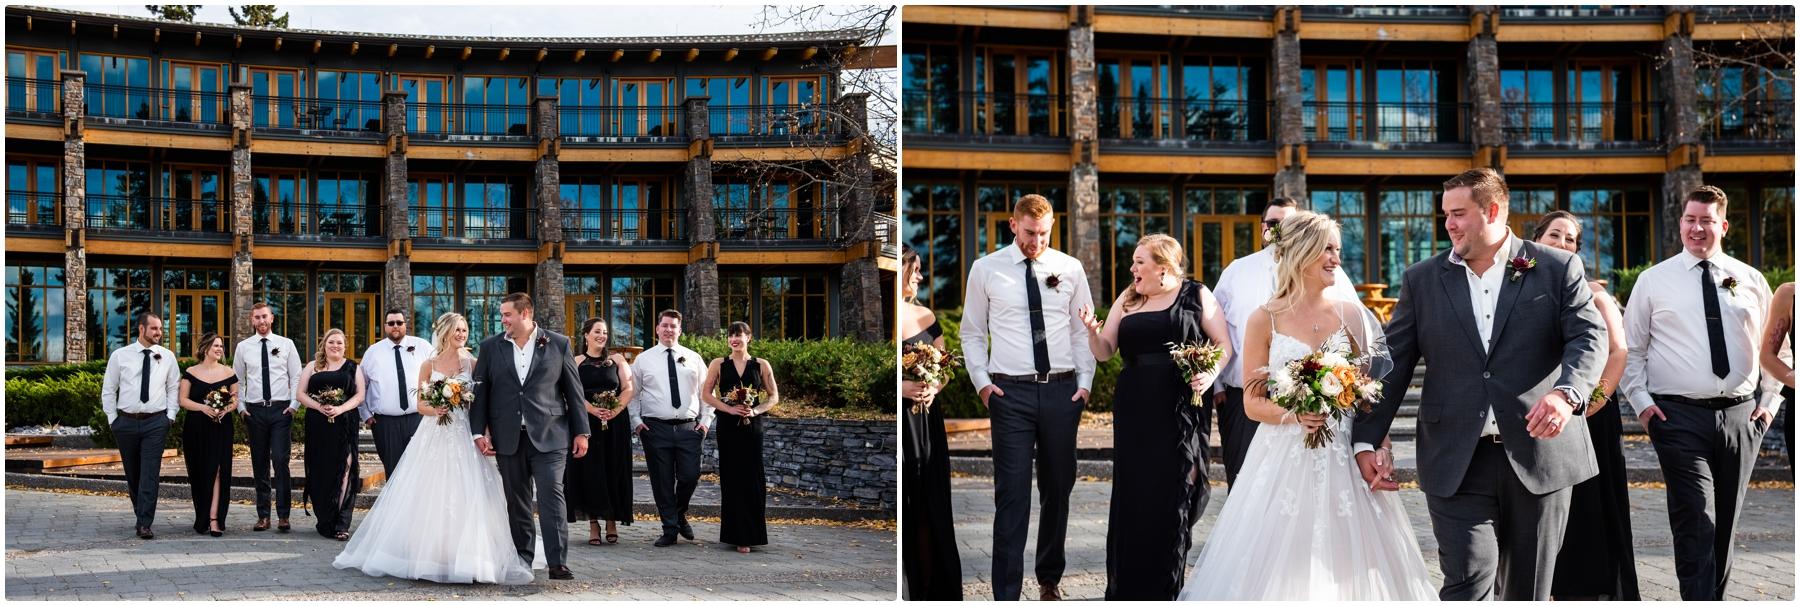 Azuridge Estate Hotel Wedding Photography